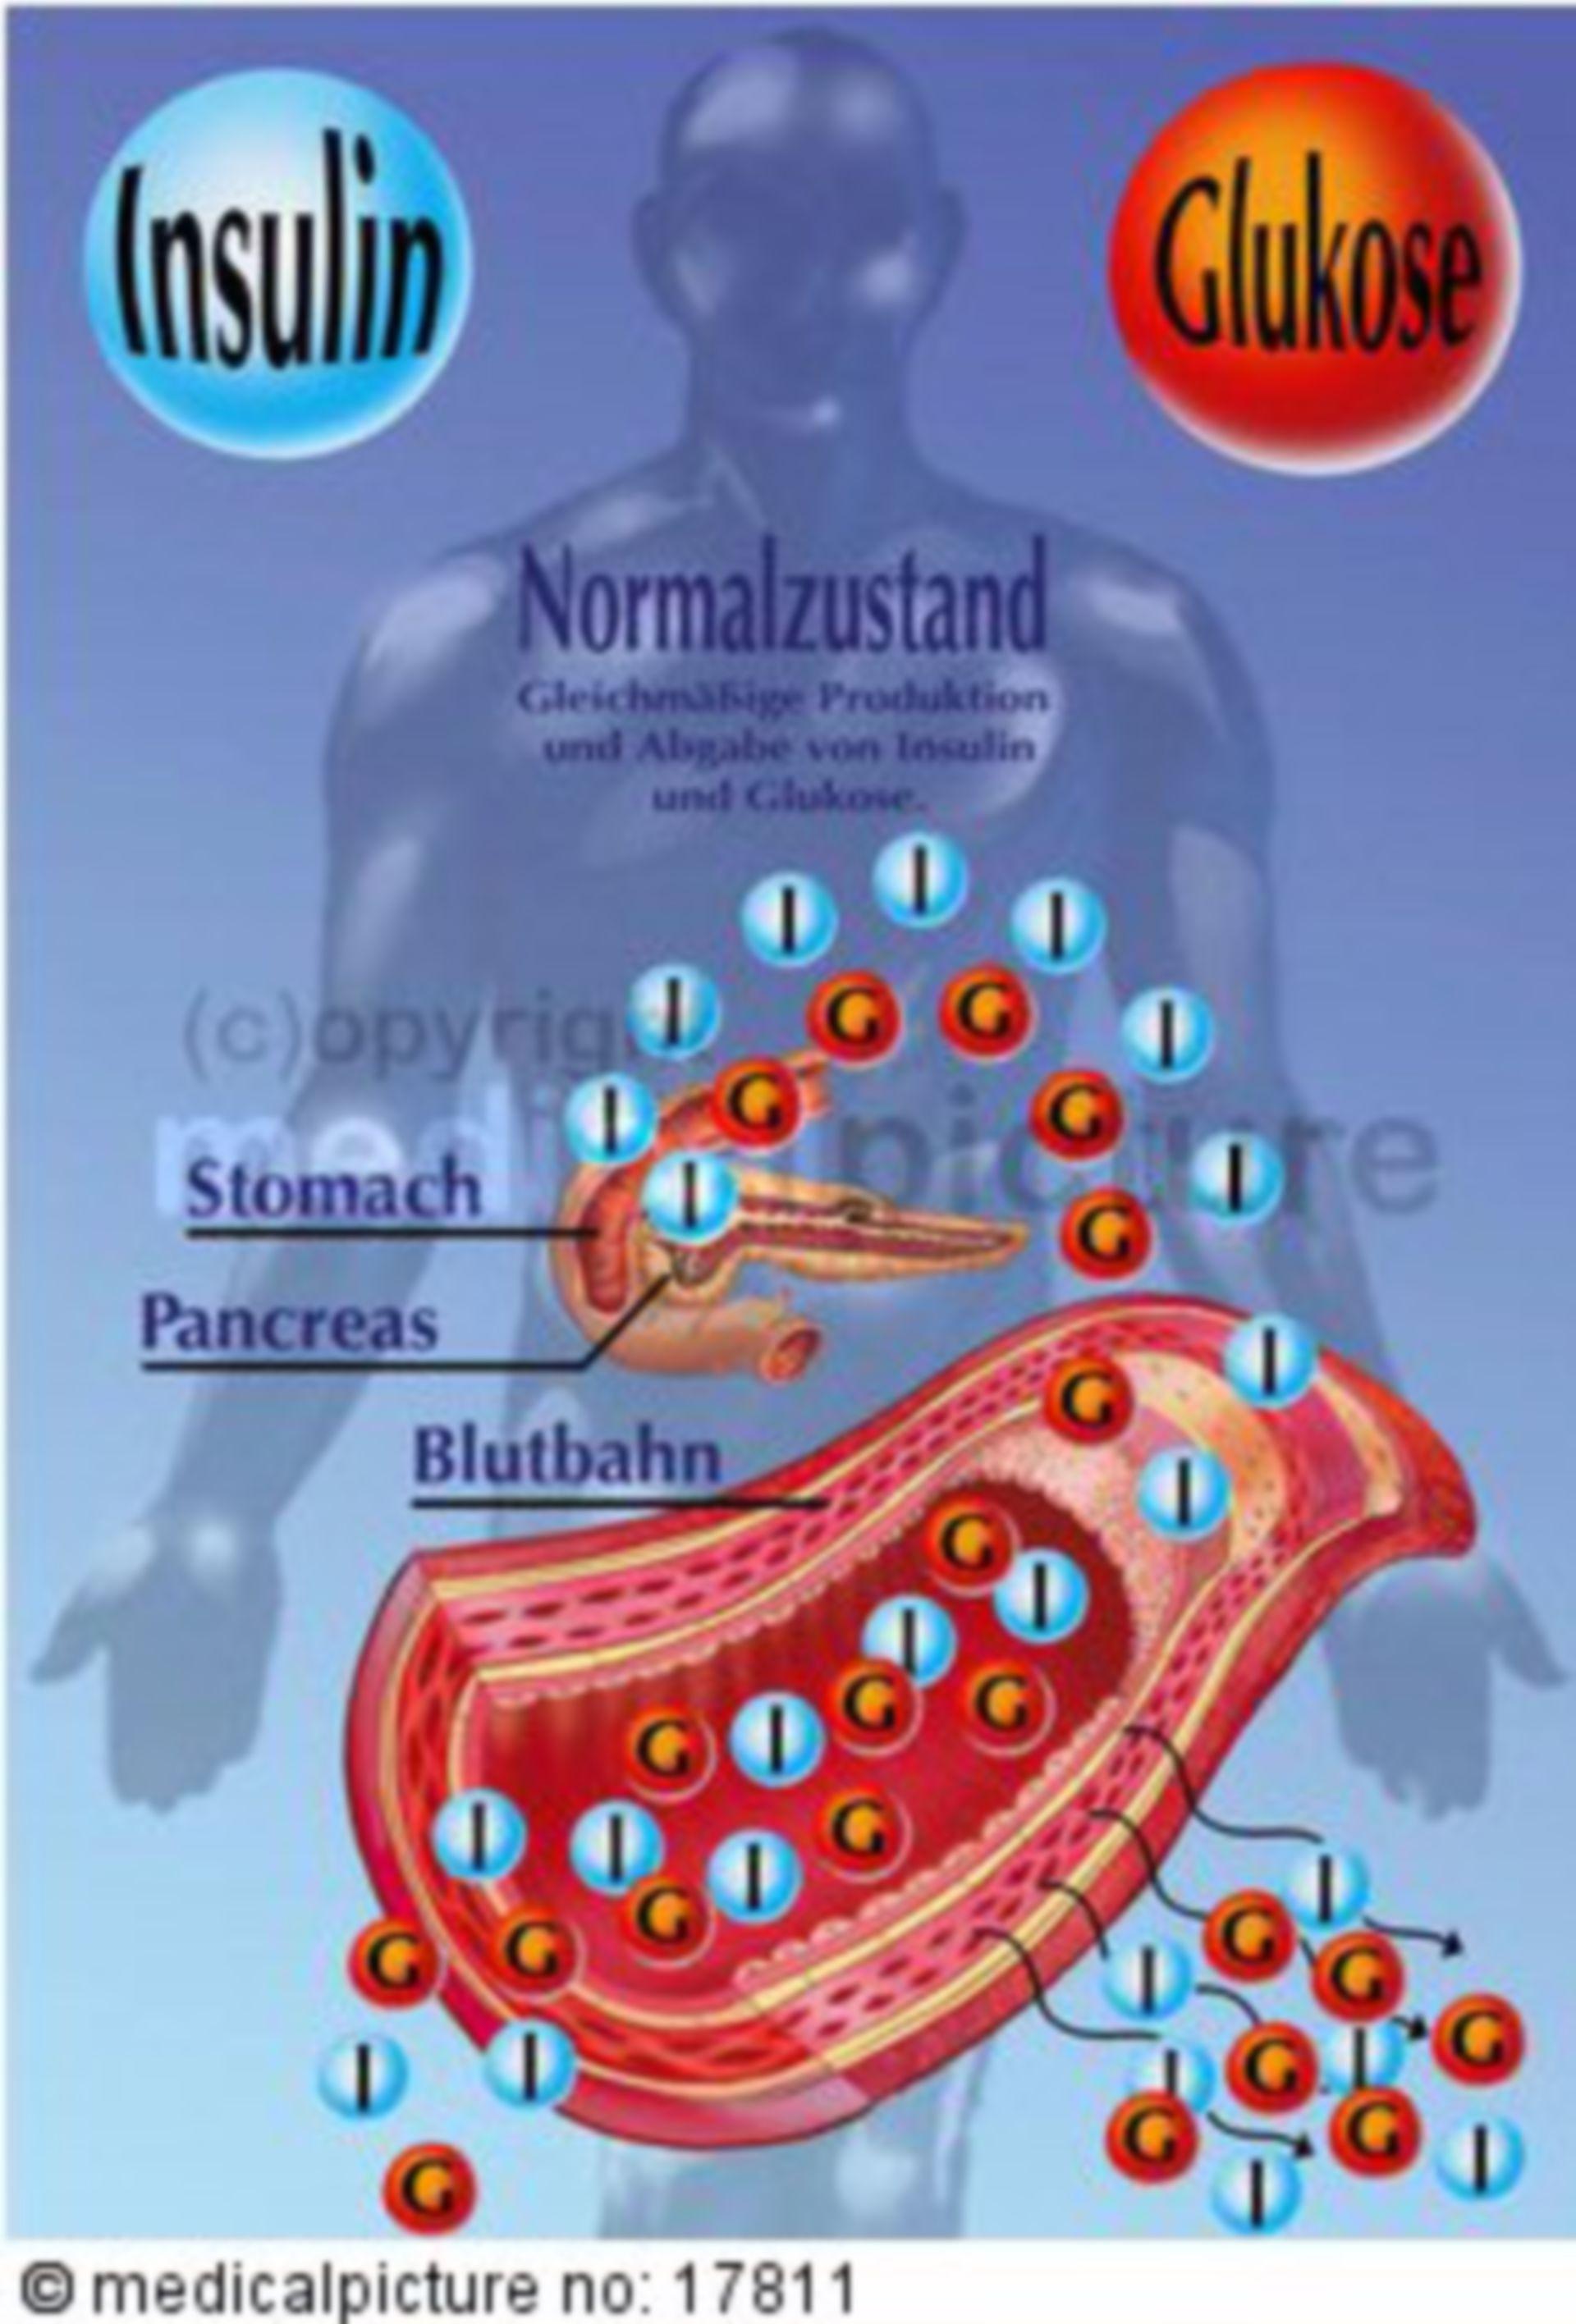 Insulin secretion